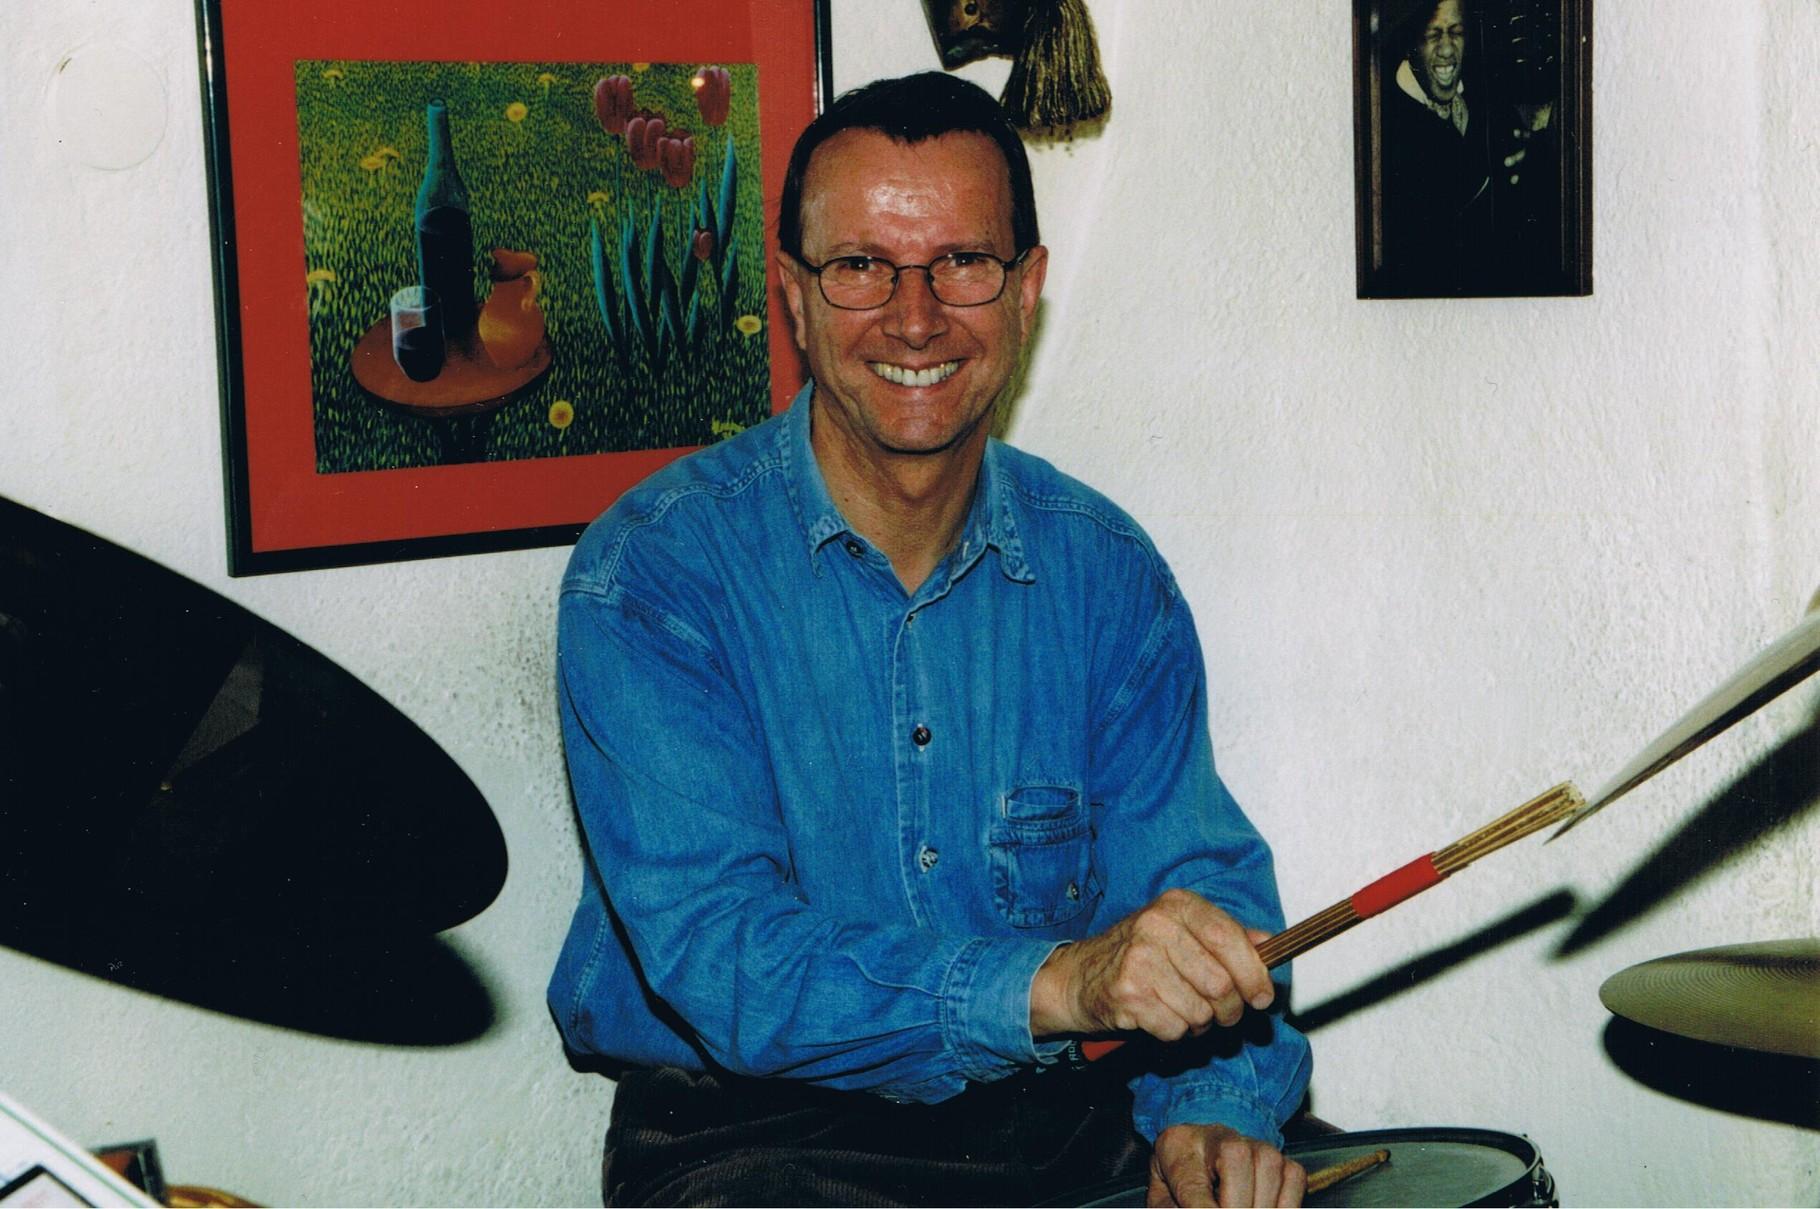 Adi Jüstel am Schlagzeug im Altstadtkeller